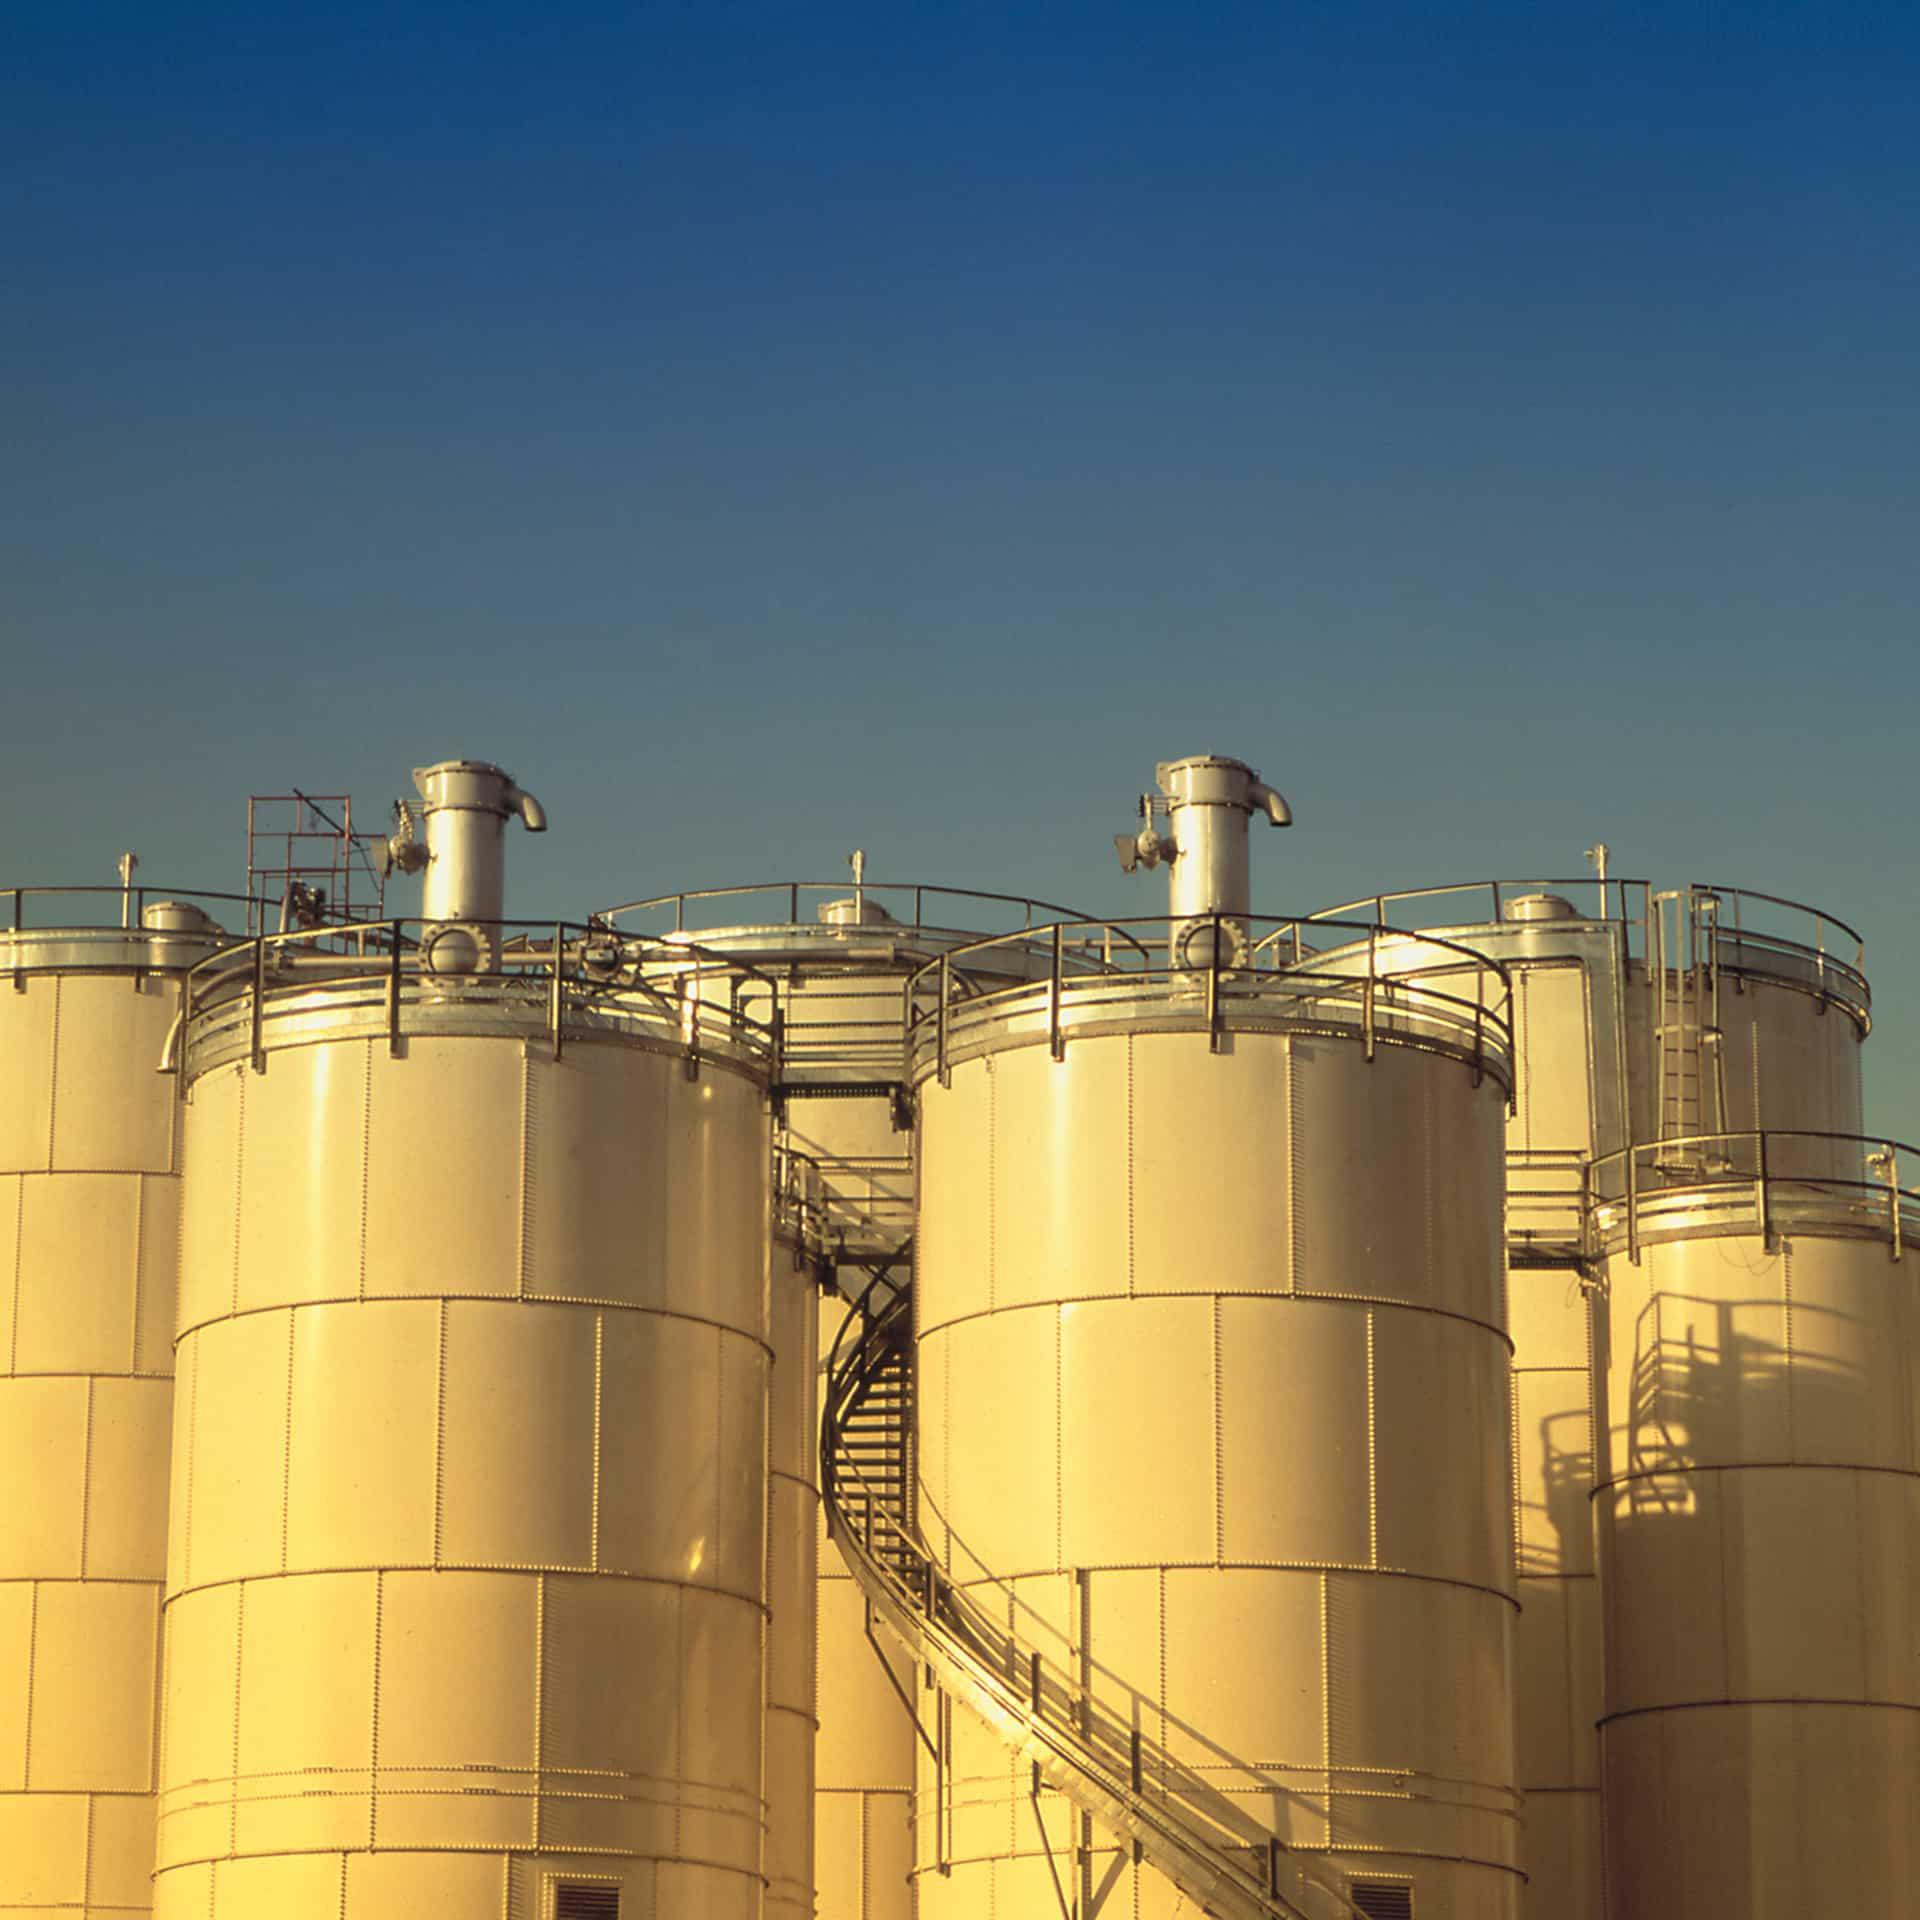 DanielZheng_Industrial_Energy_005